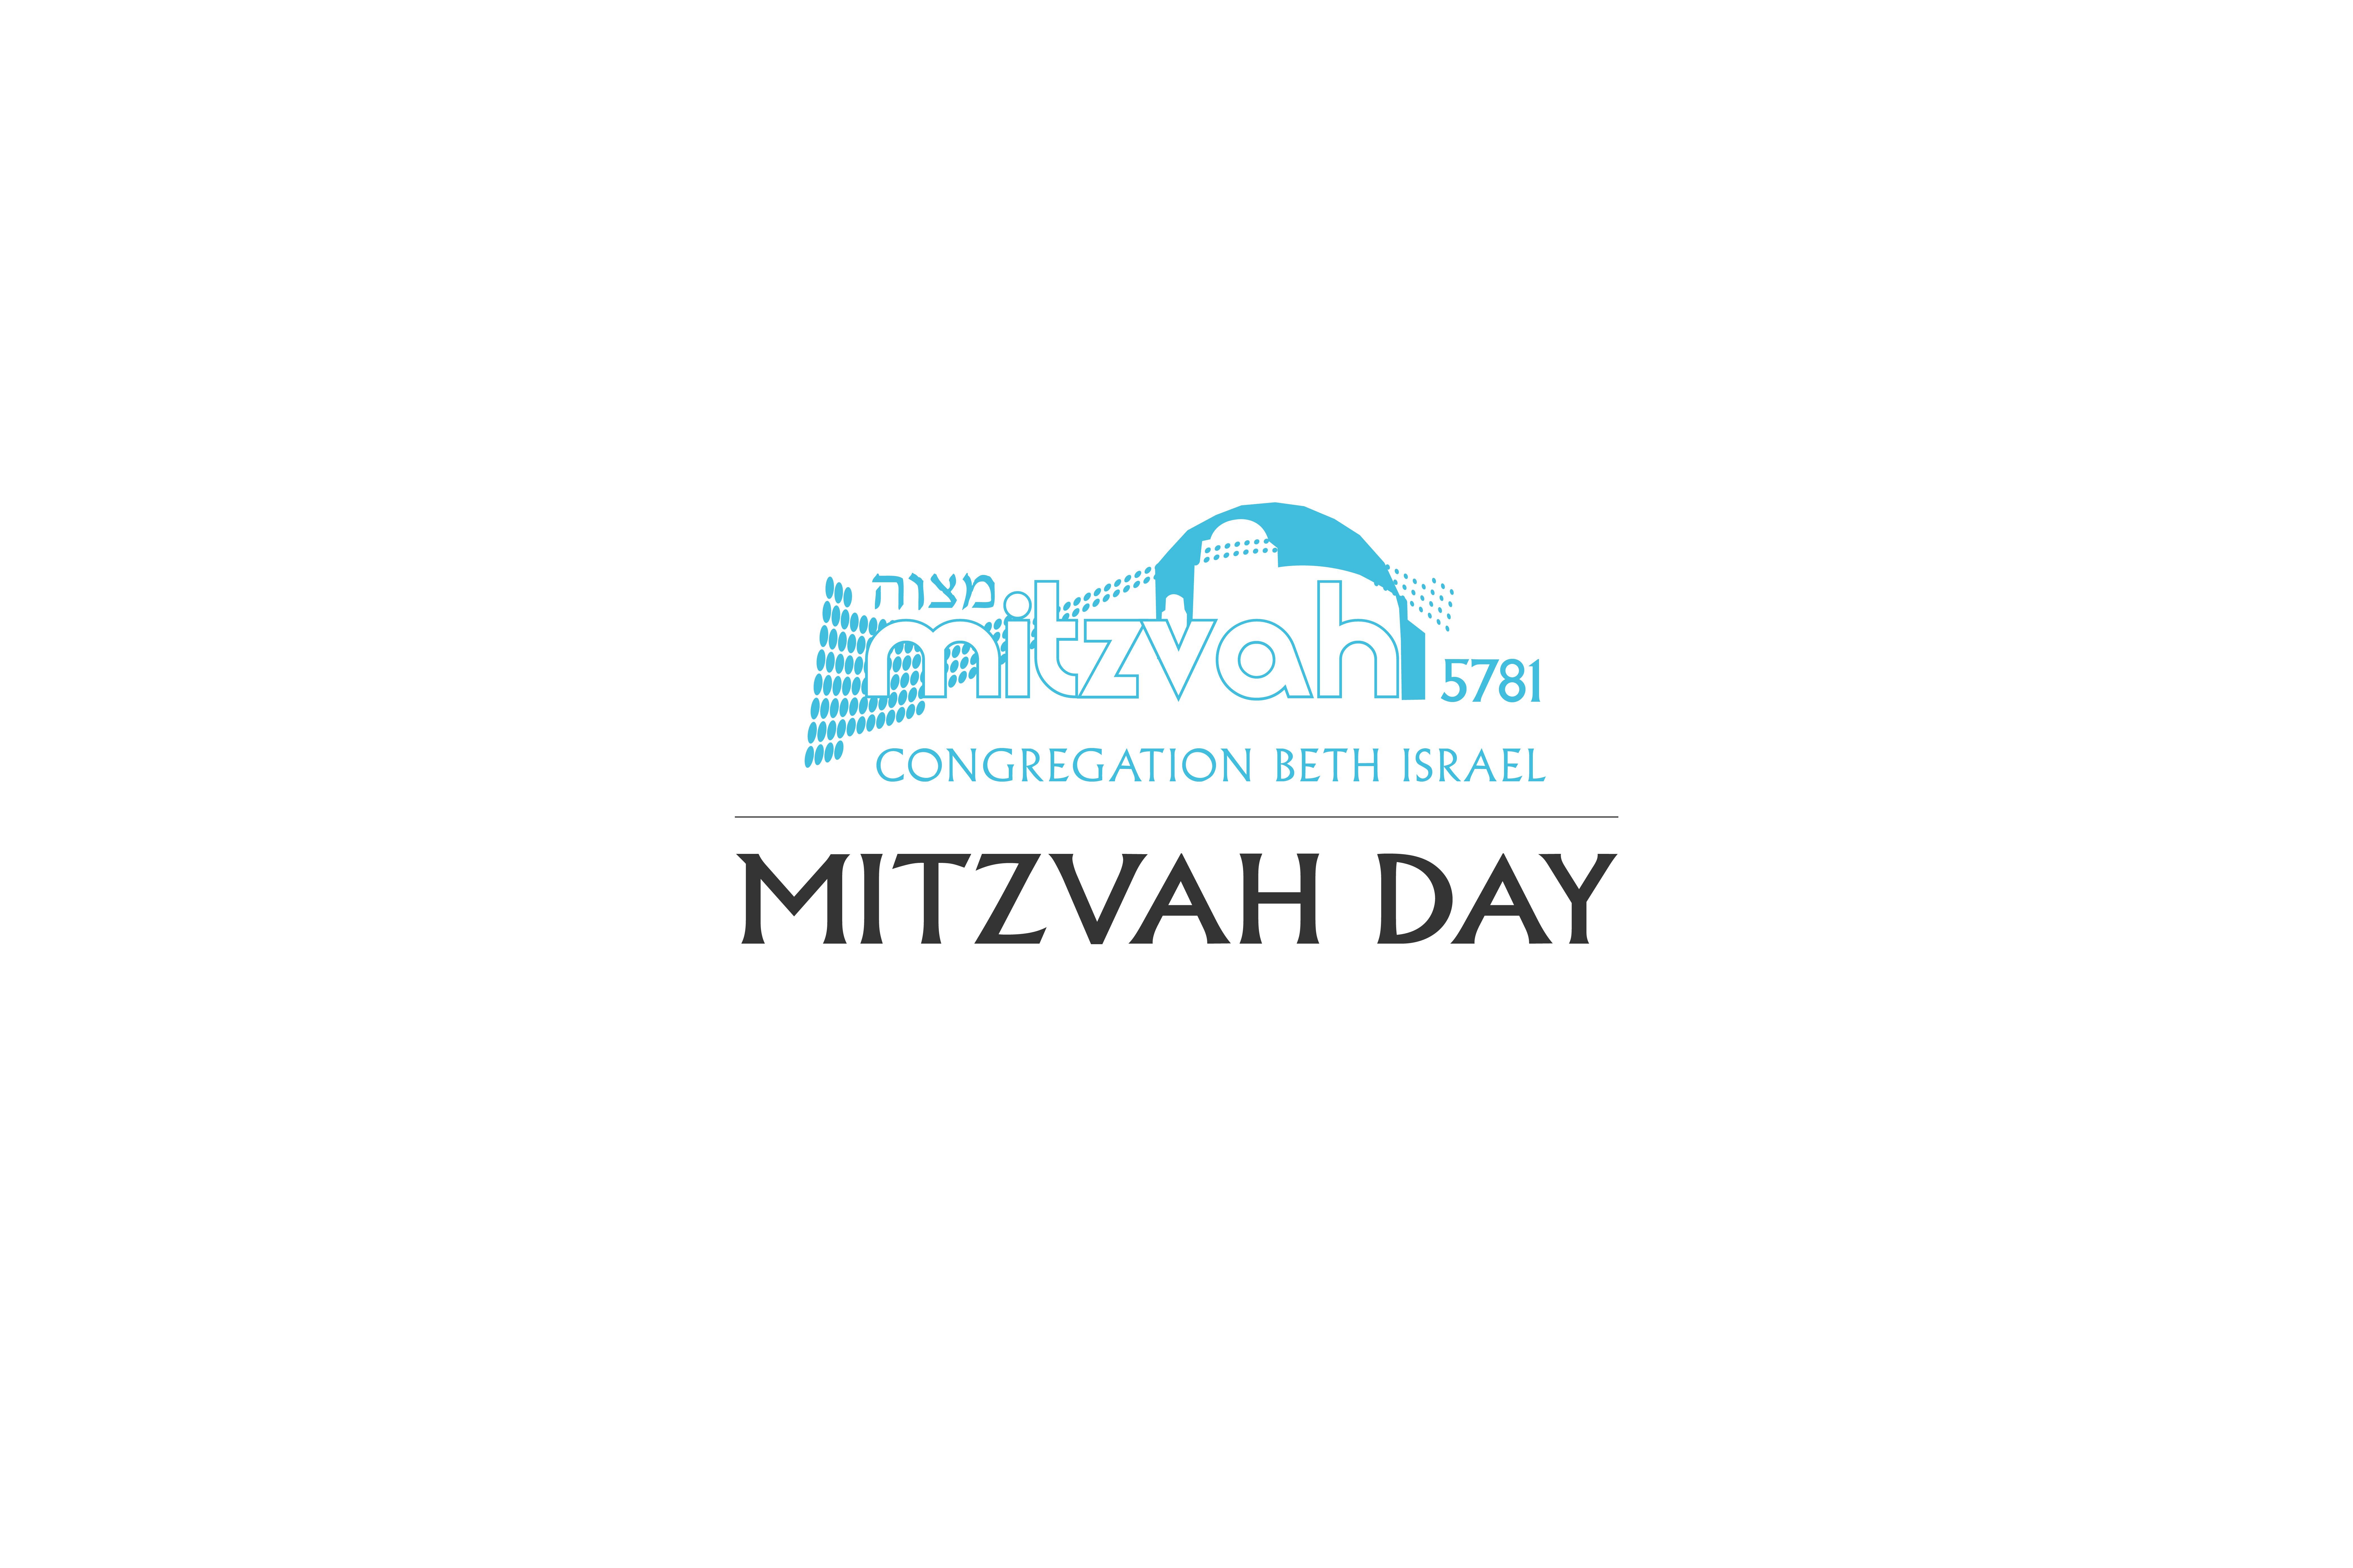 Mitzvah Day